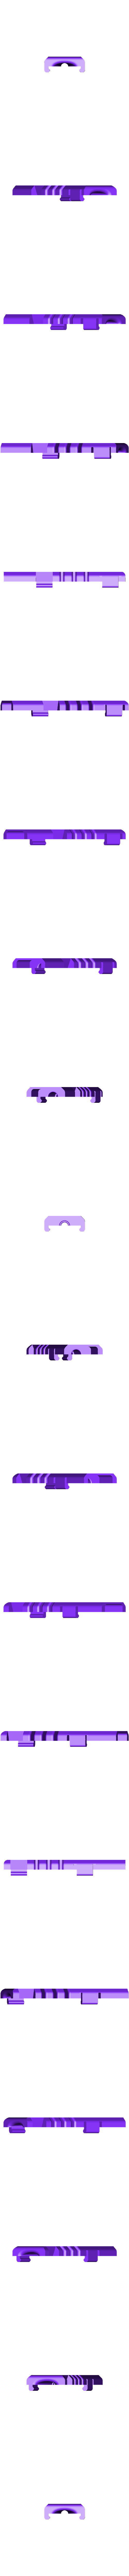 V1_T_Variant_-_Magsafe_Armor_Upper.stl Télécharger fichier STL gratuit Armure Magsafe • Modèle pour impression 3D, Palemar